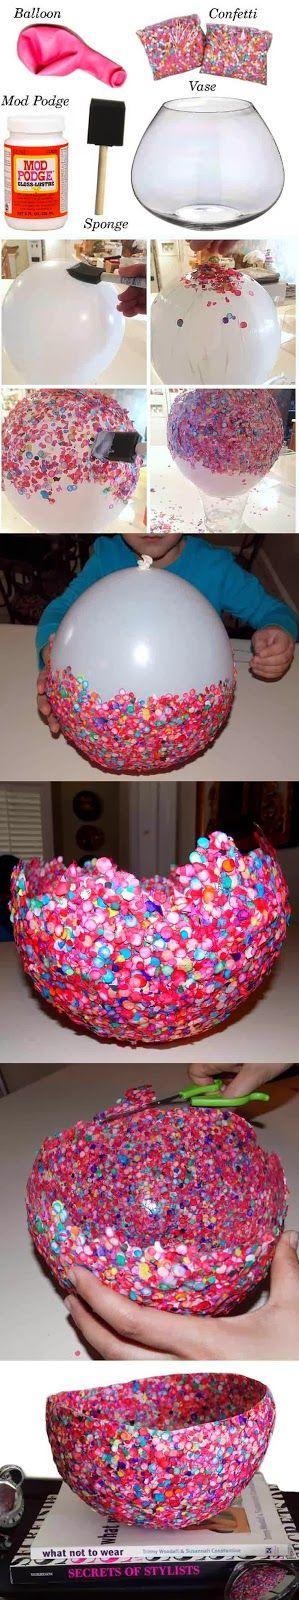 DIY Confetti Bowl - Plan Provision